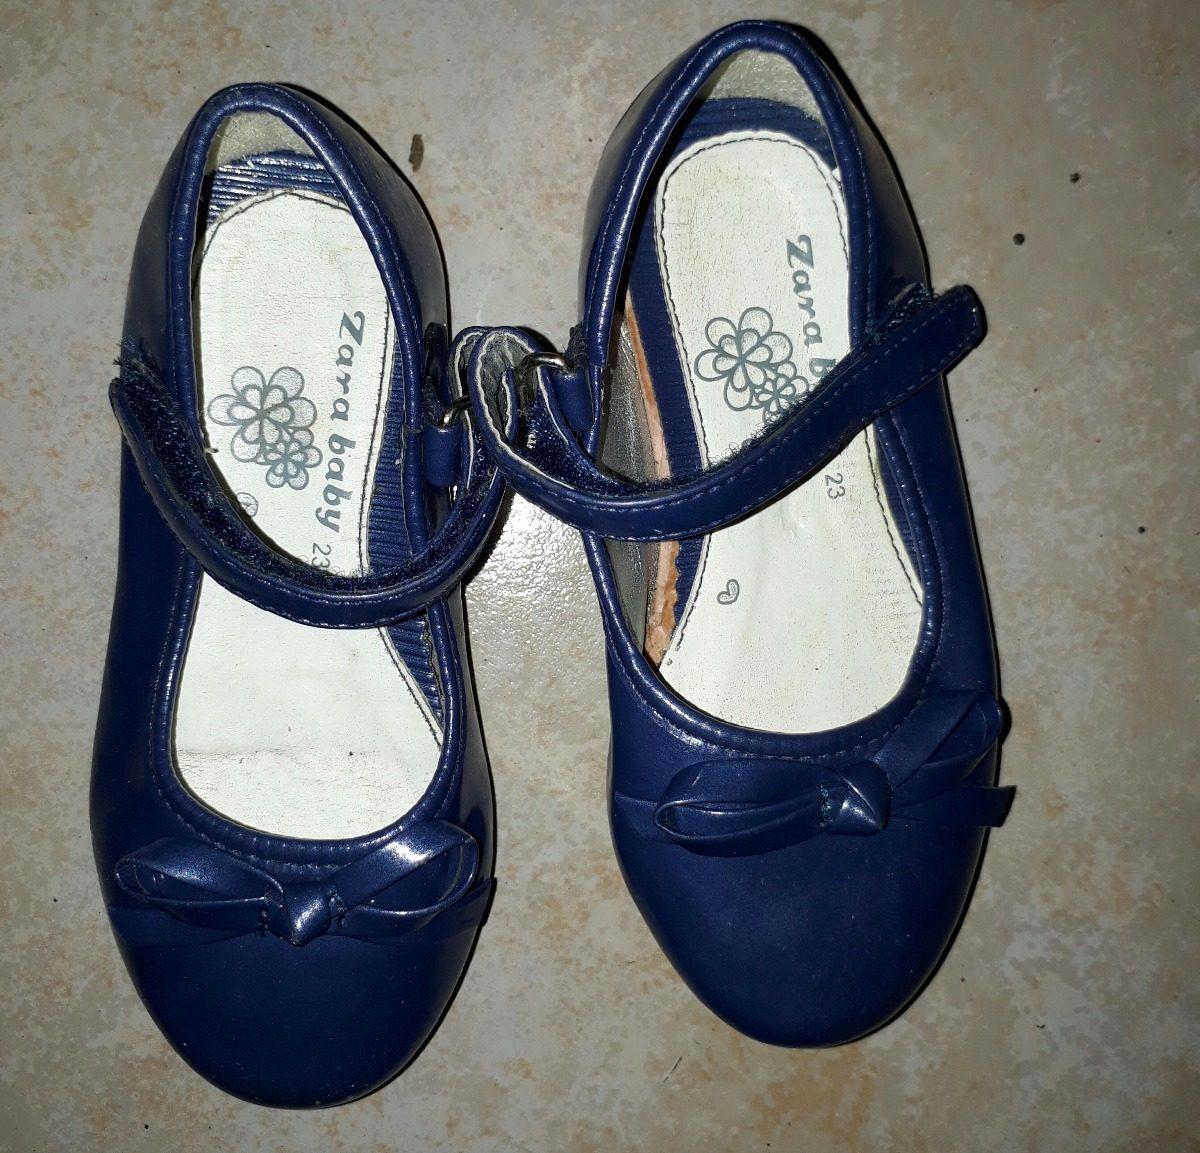 23 De Nena Talle Marino Zapatos Divinos Charol Azul Zara 400 xwYfAqqO0